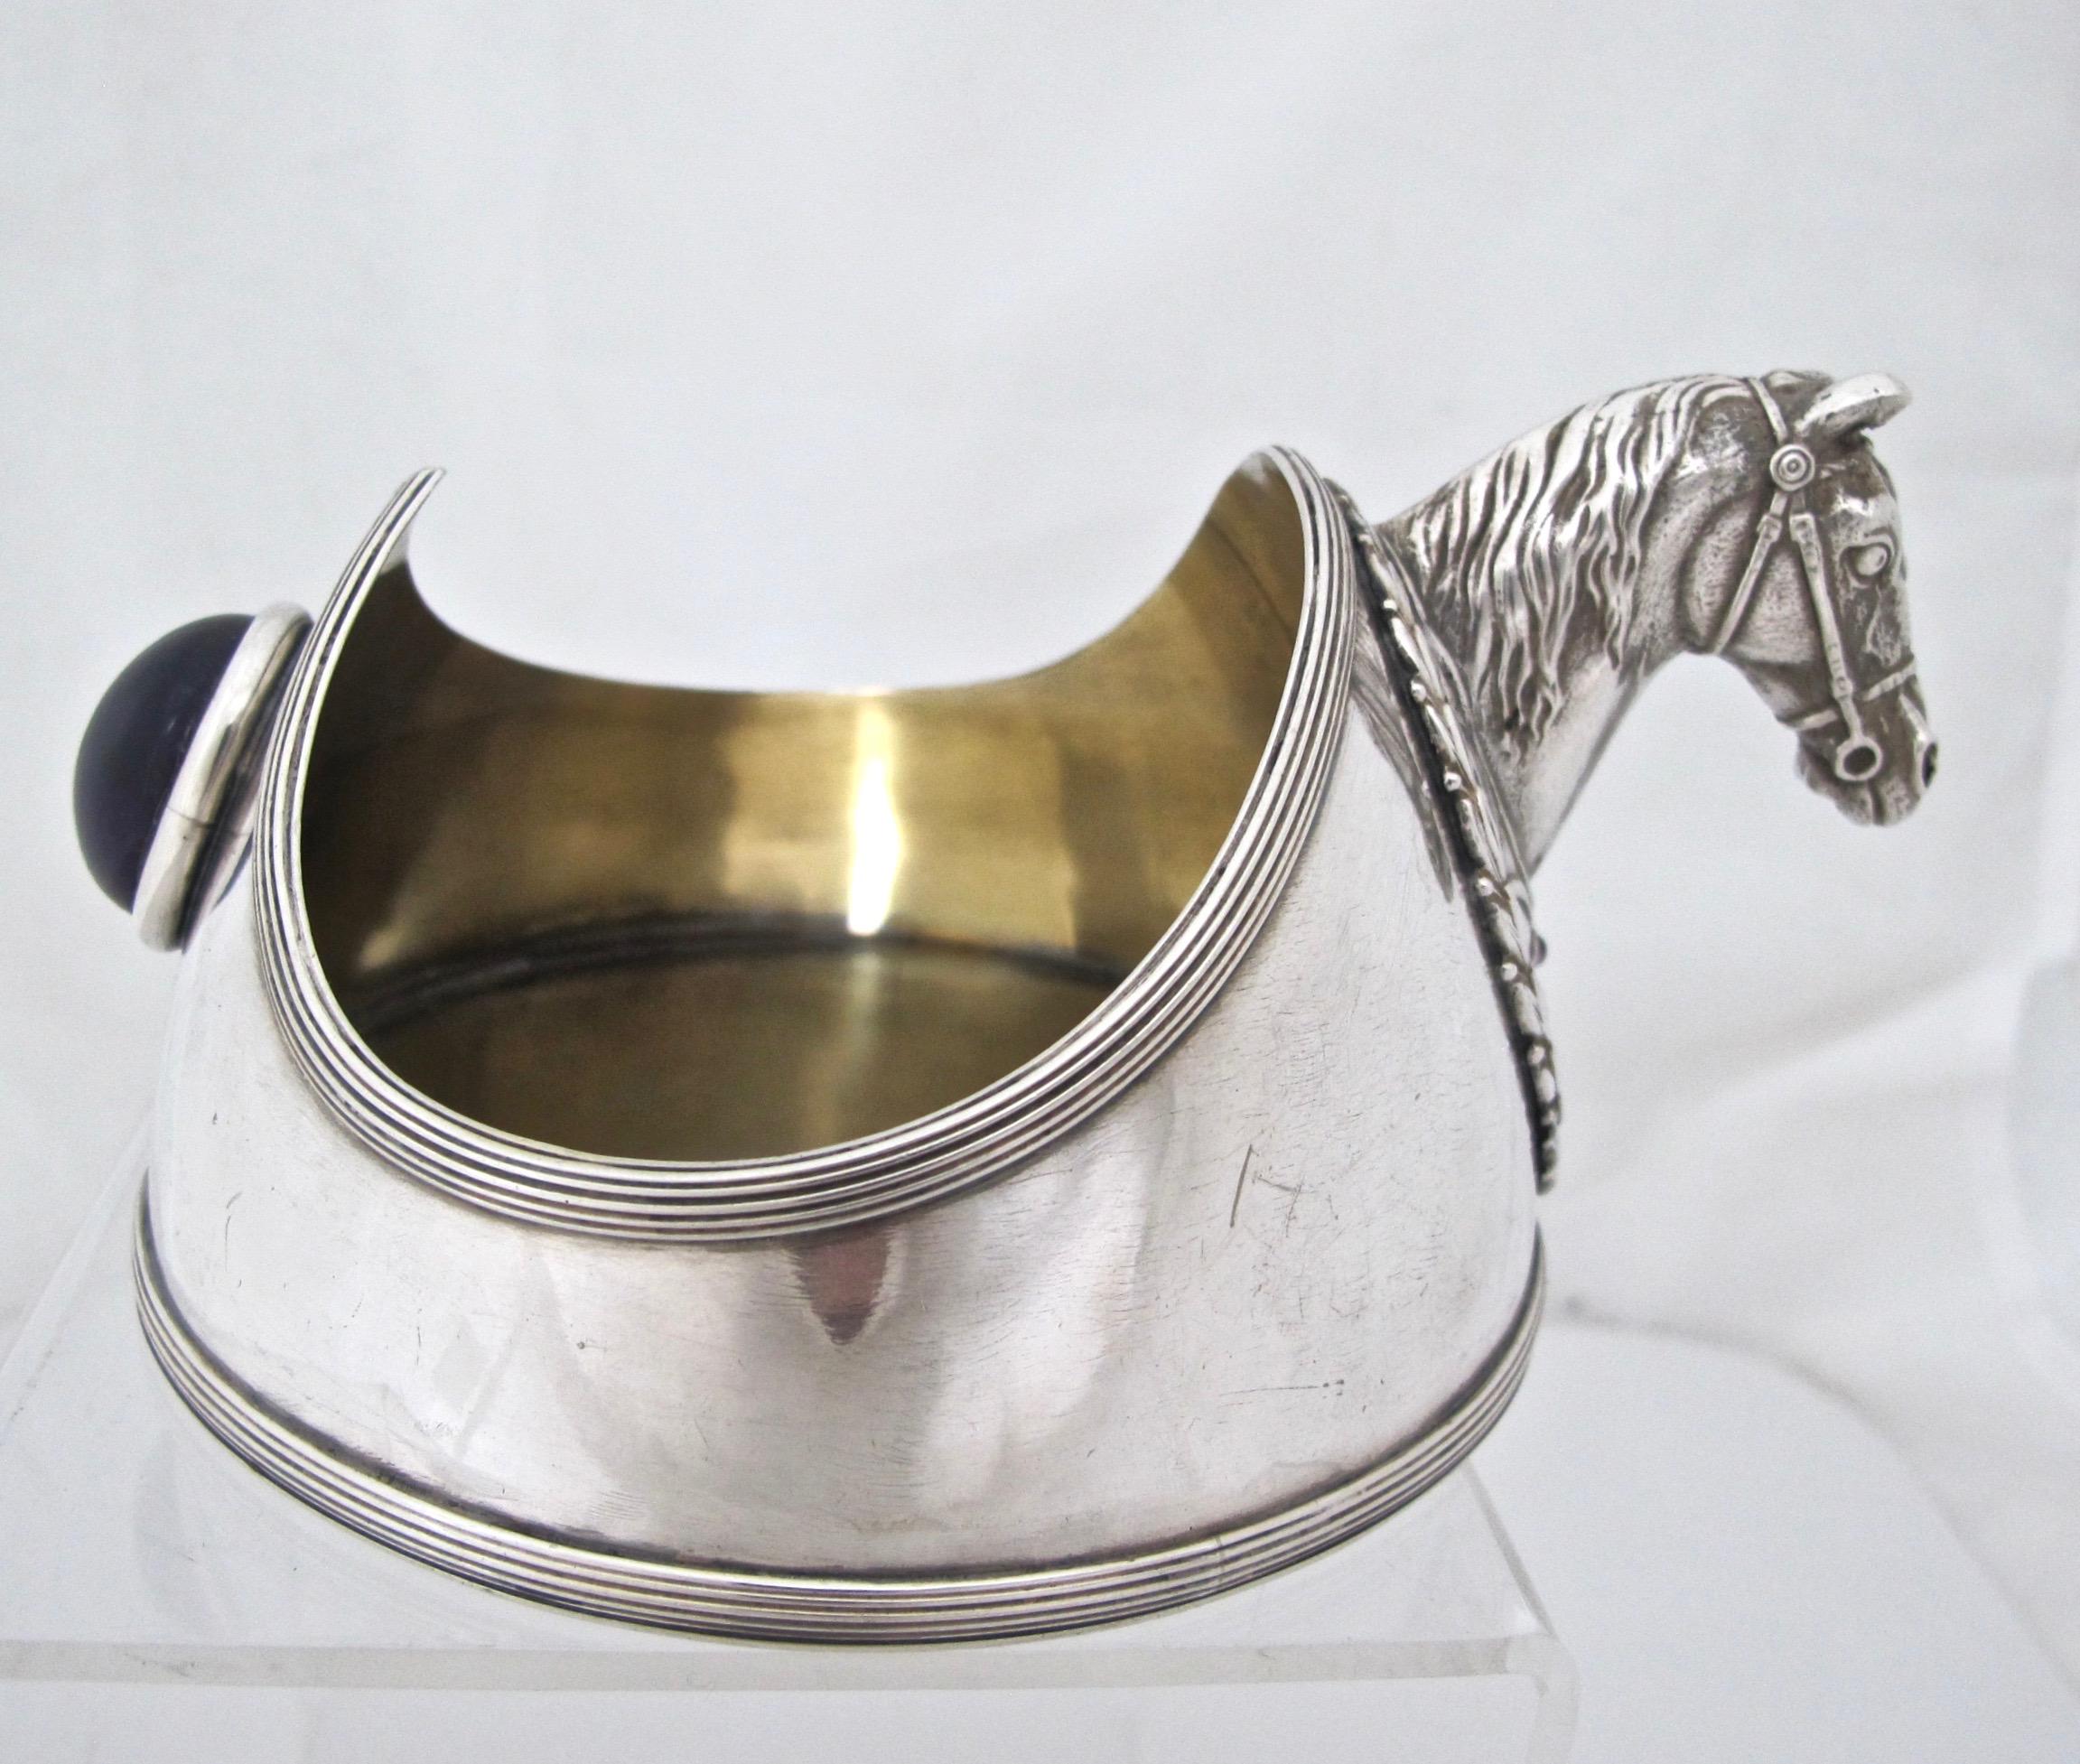 Carlyon Silver image (1 of 9)